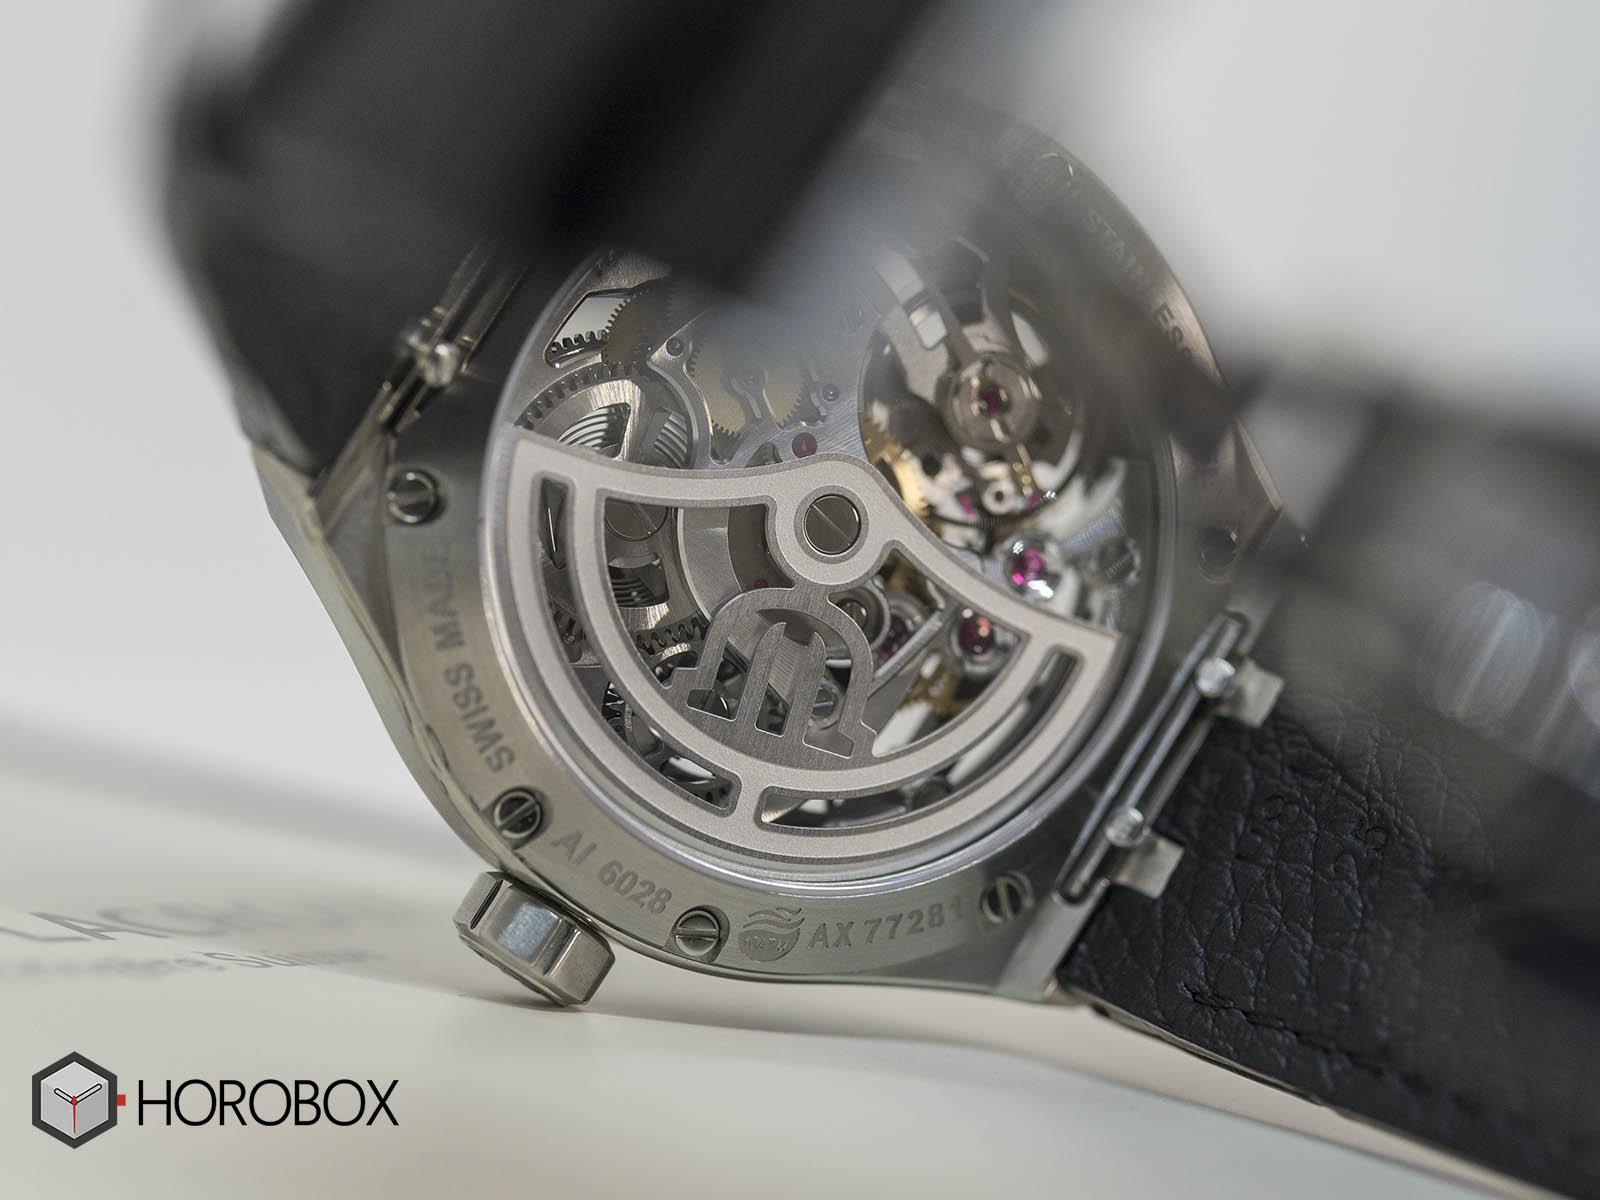 ai6028-ss001-030-1-maurice-lacroix-aikon-automatic-skeleton-2.jpg